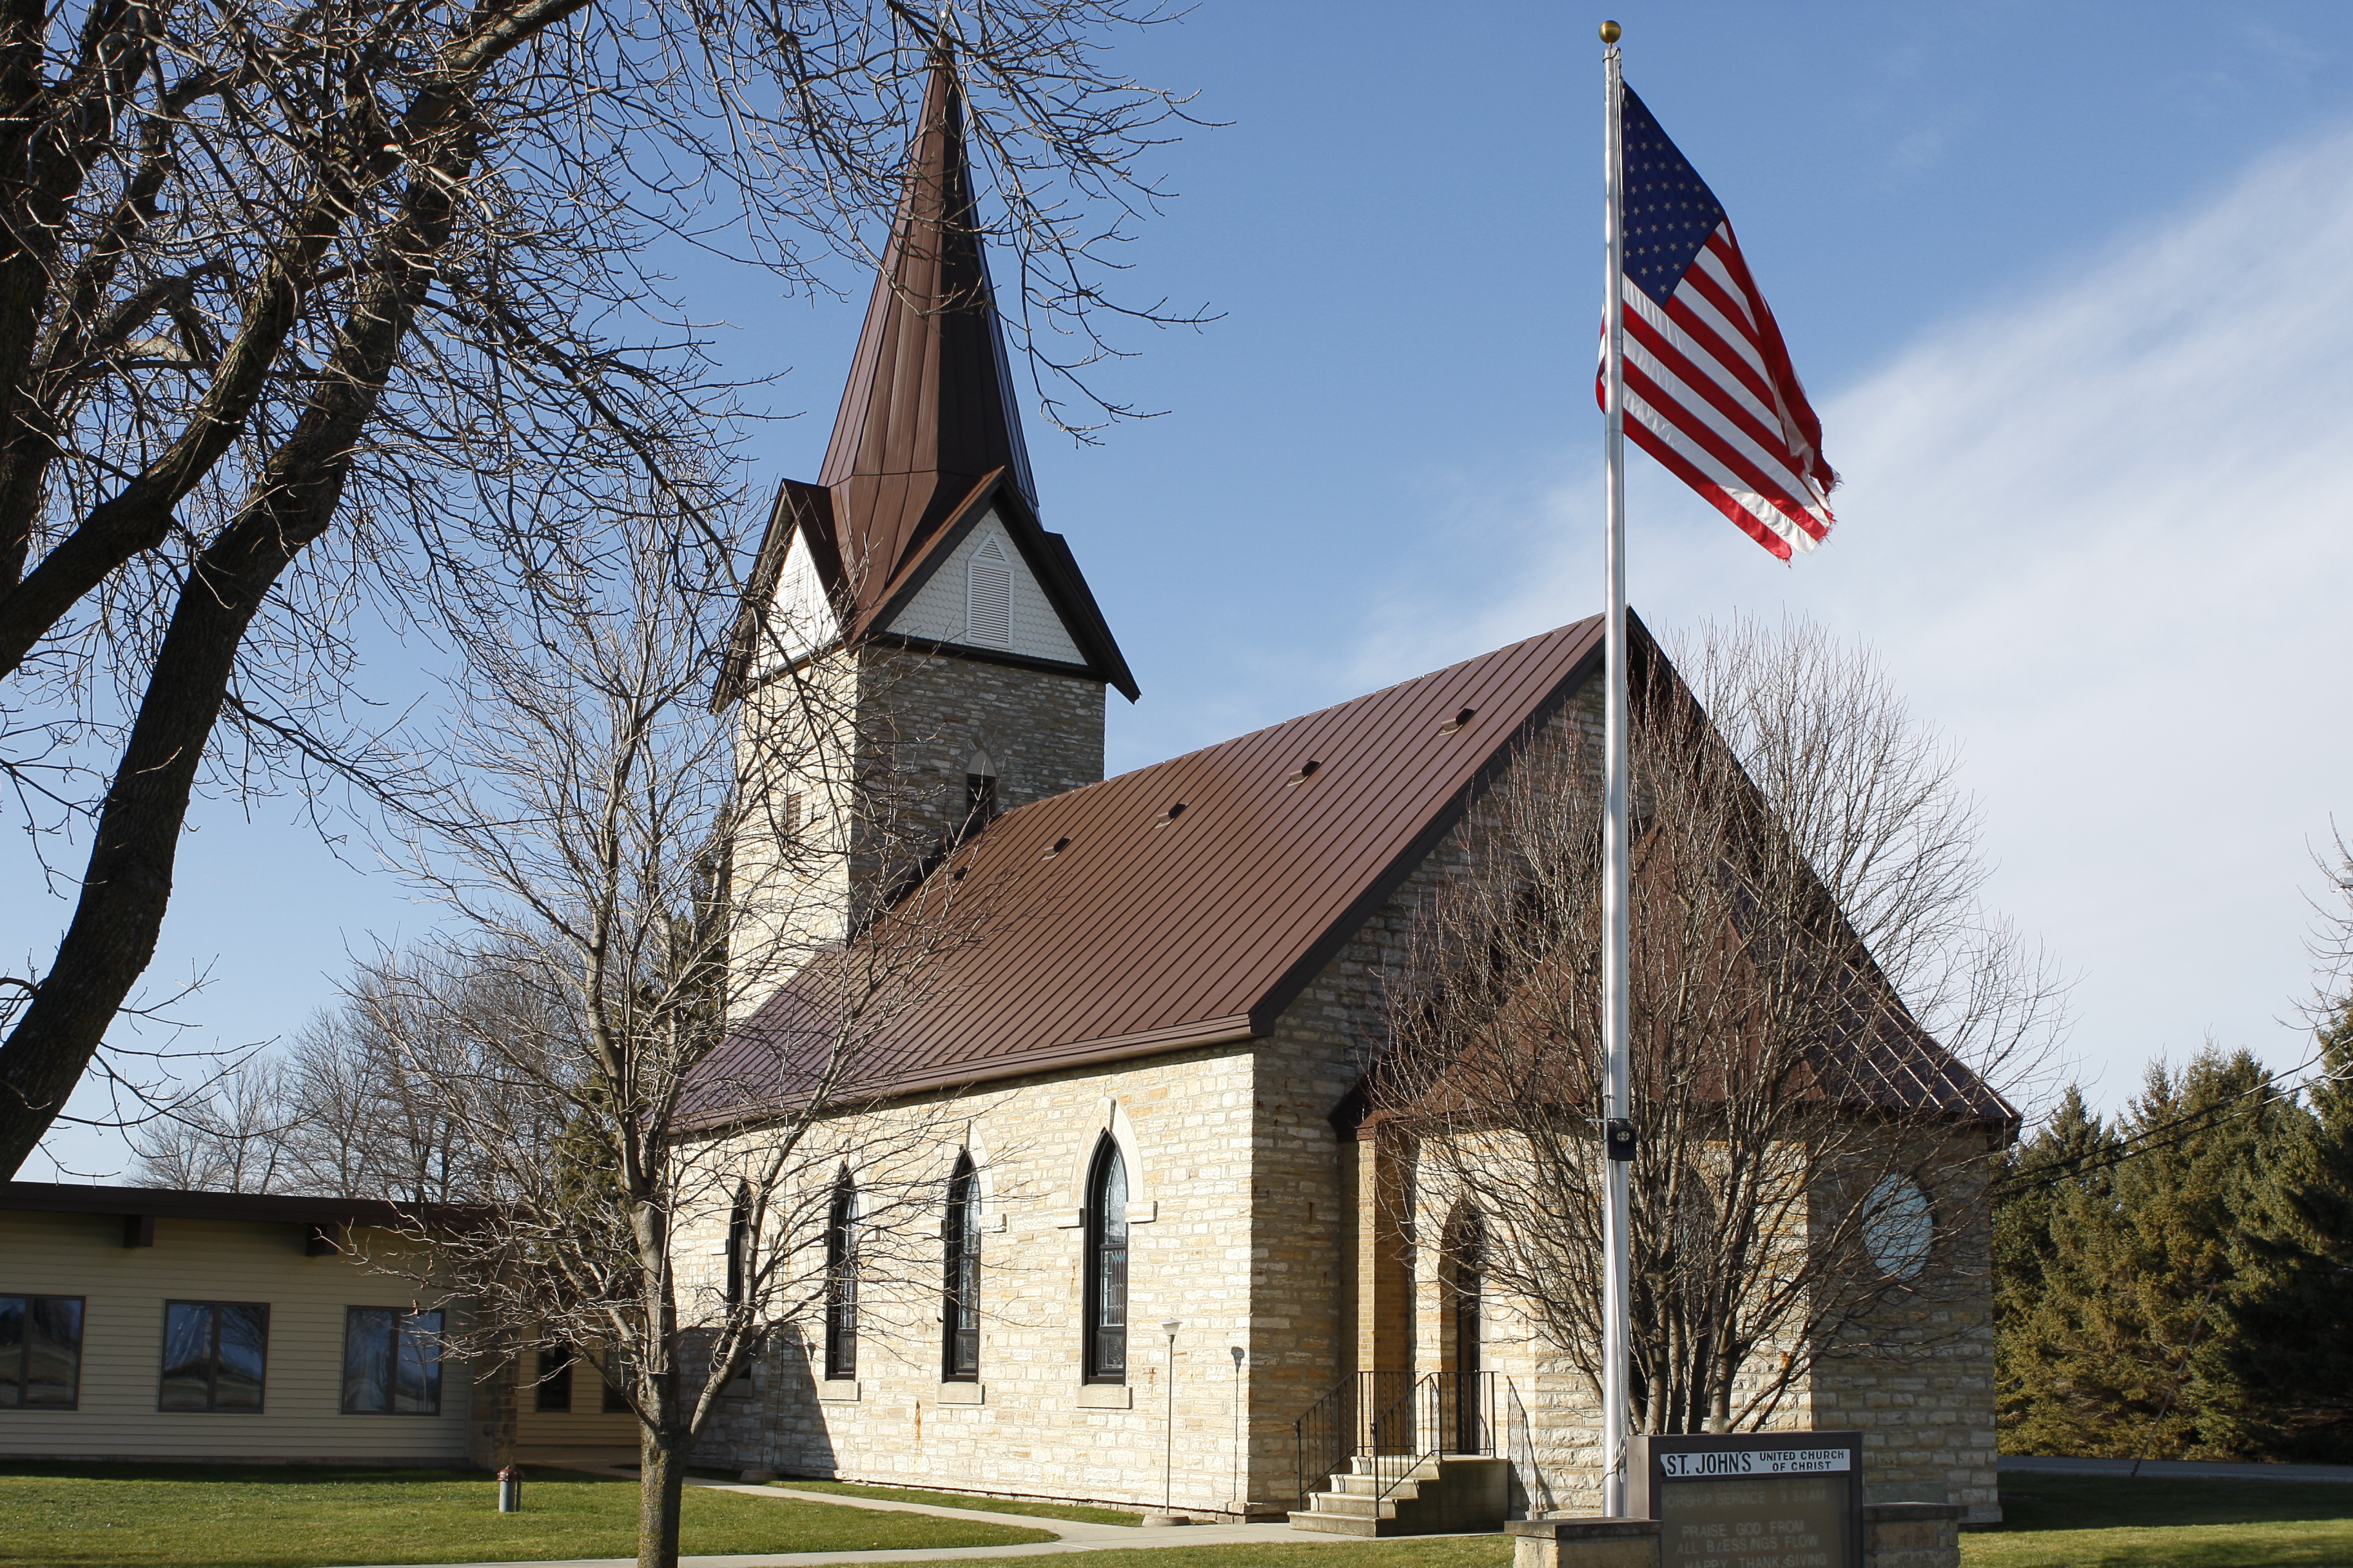 Standing seam sheet metal roofing mansard brown dark church commercial st. john's united christ wisconsin illinois minnesota iowa north dakota